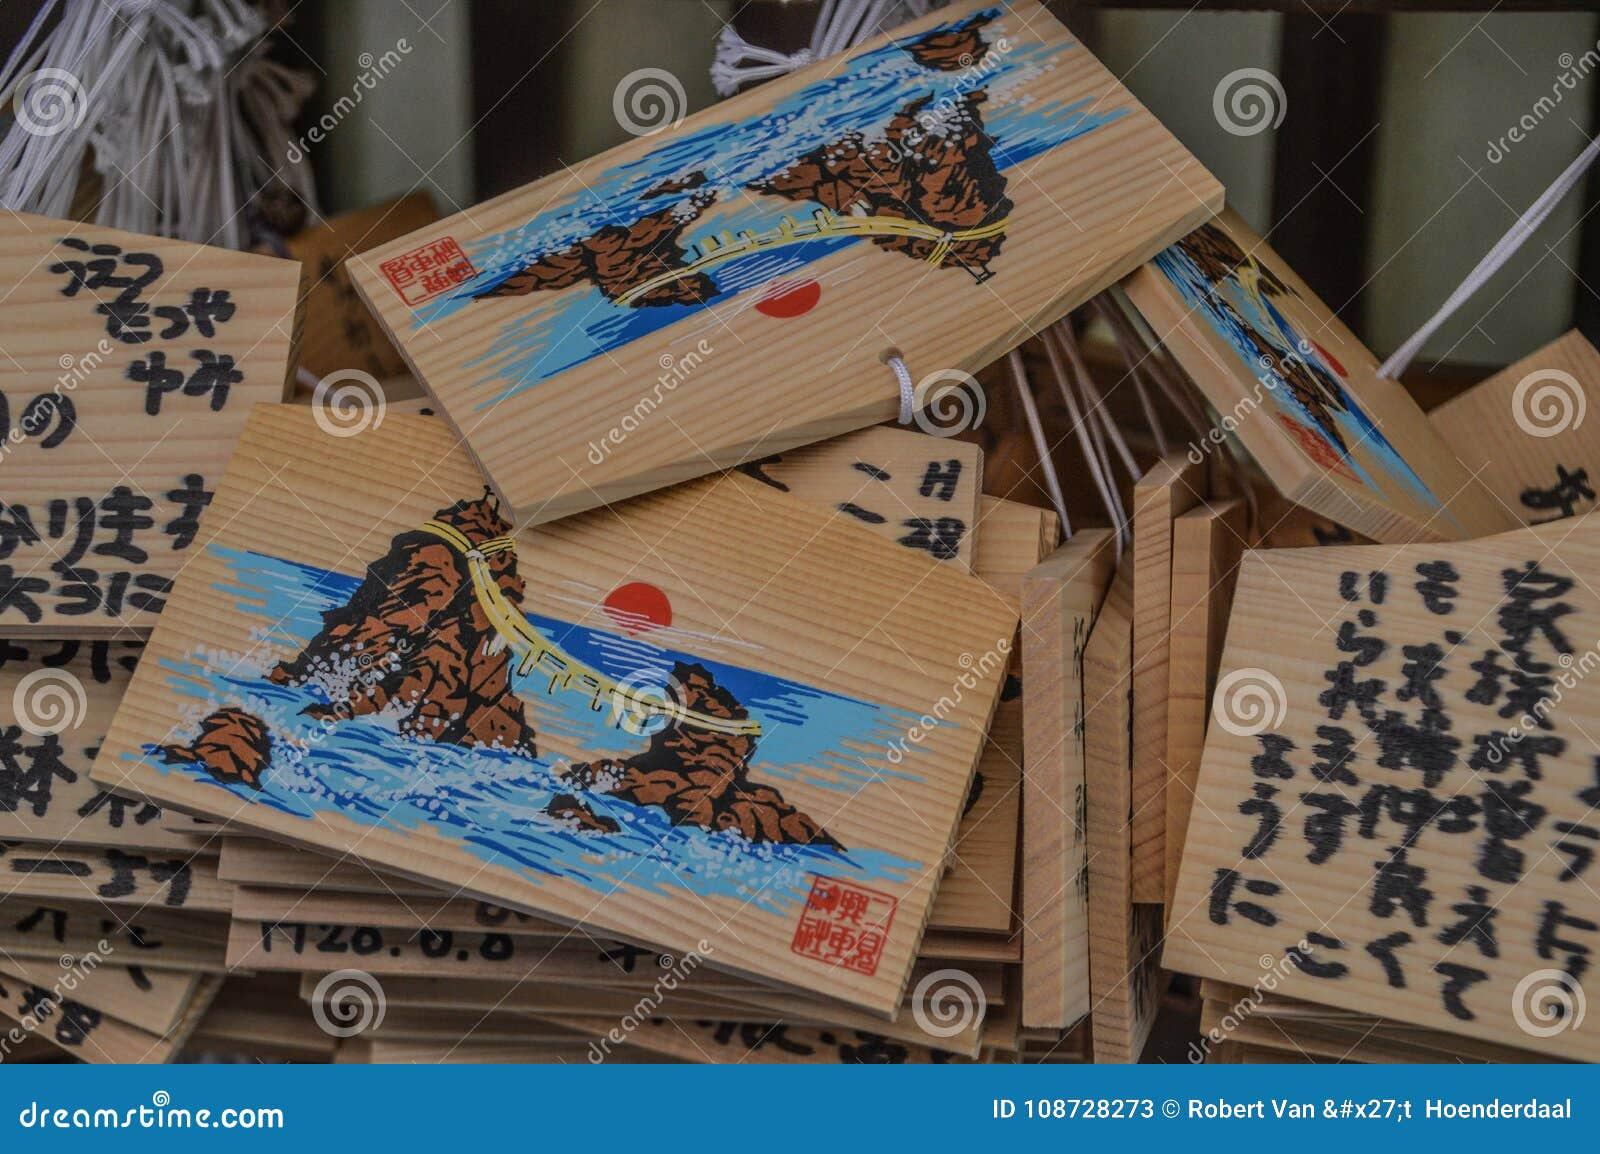 Ema From Okitama Shrine At Ise Japan